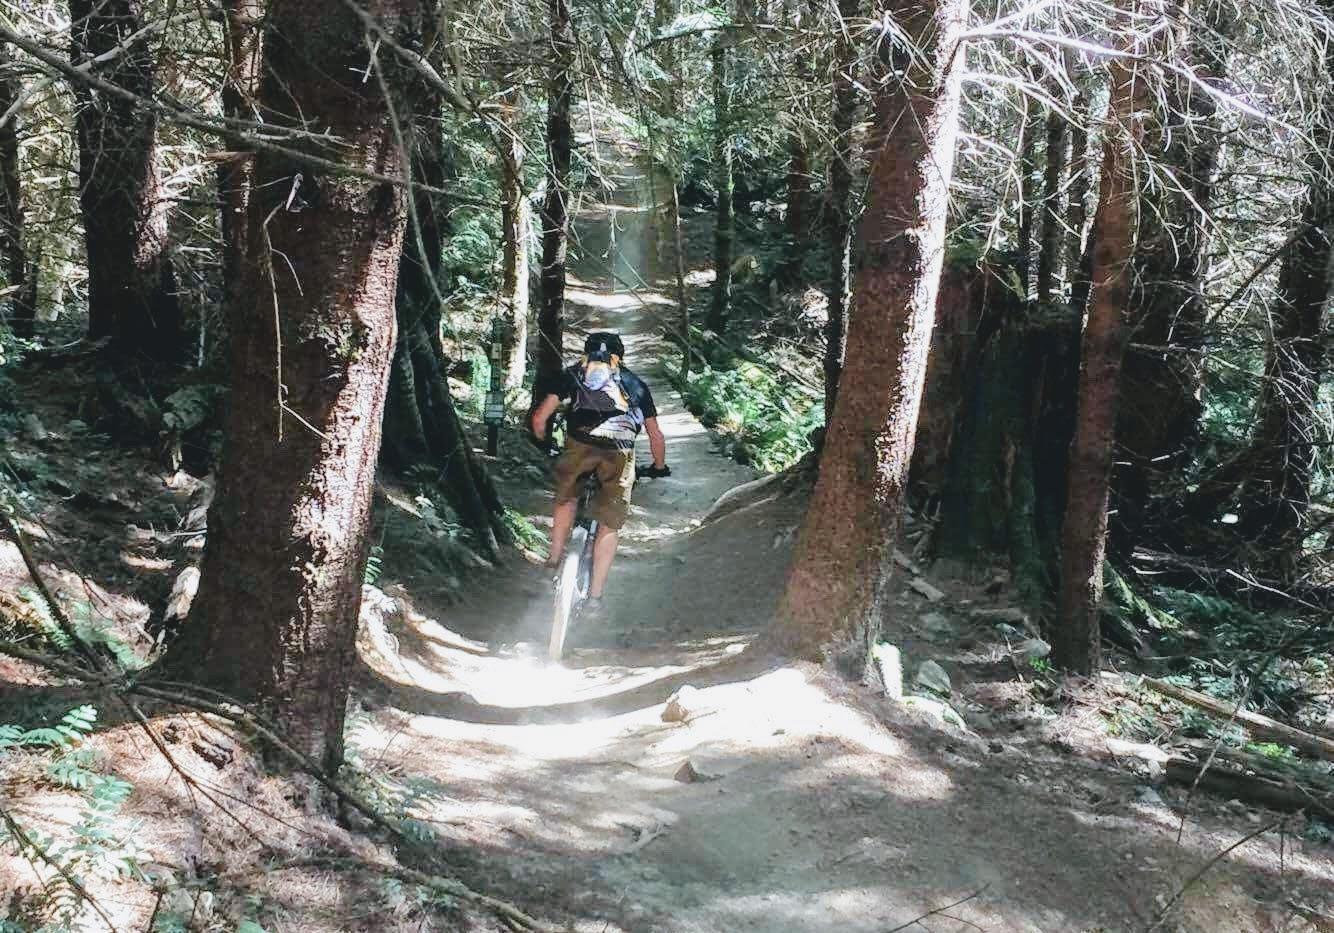 Squamish_MtnBikingJPG